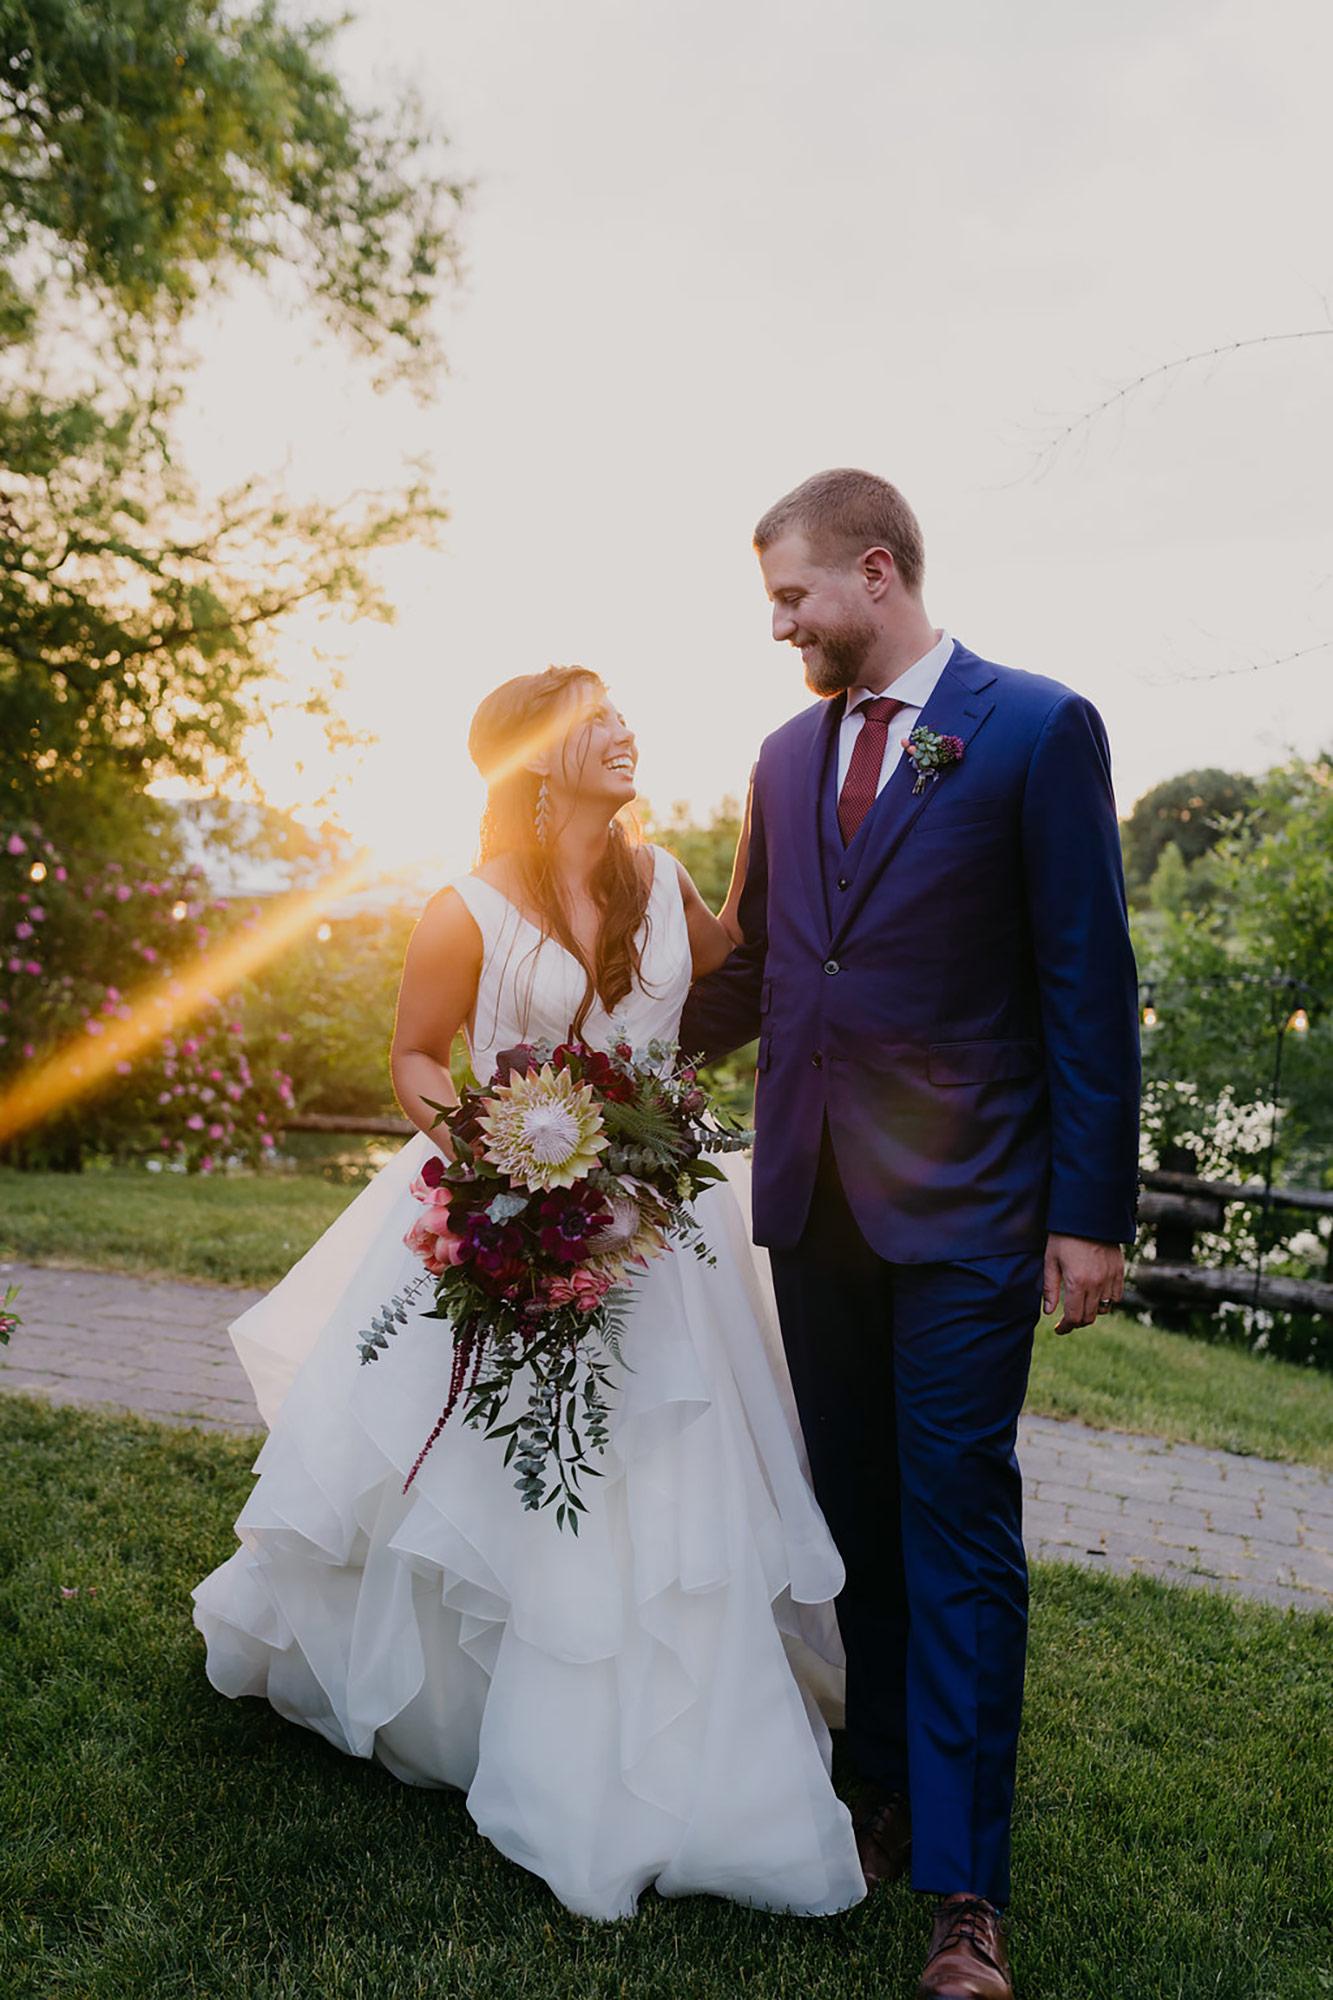 Kurtz-Orchards-Wedding-Niagara-wedding-Vineyard-Bride-Photography-by-Kayla-Rocca-047.JPG